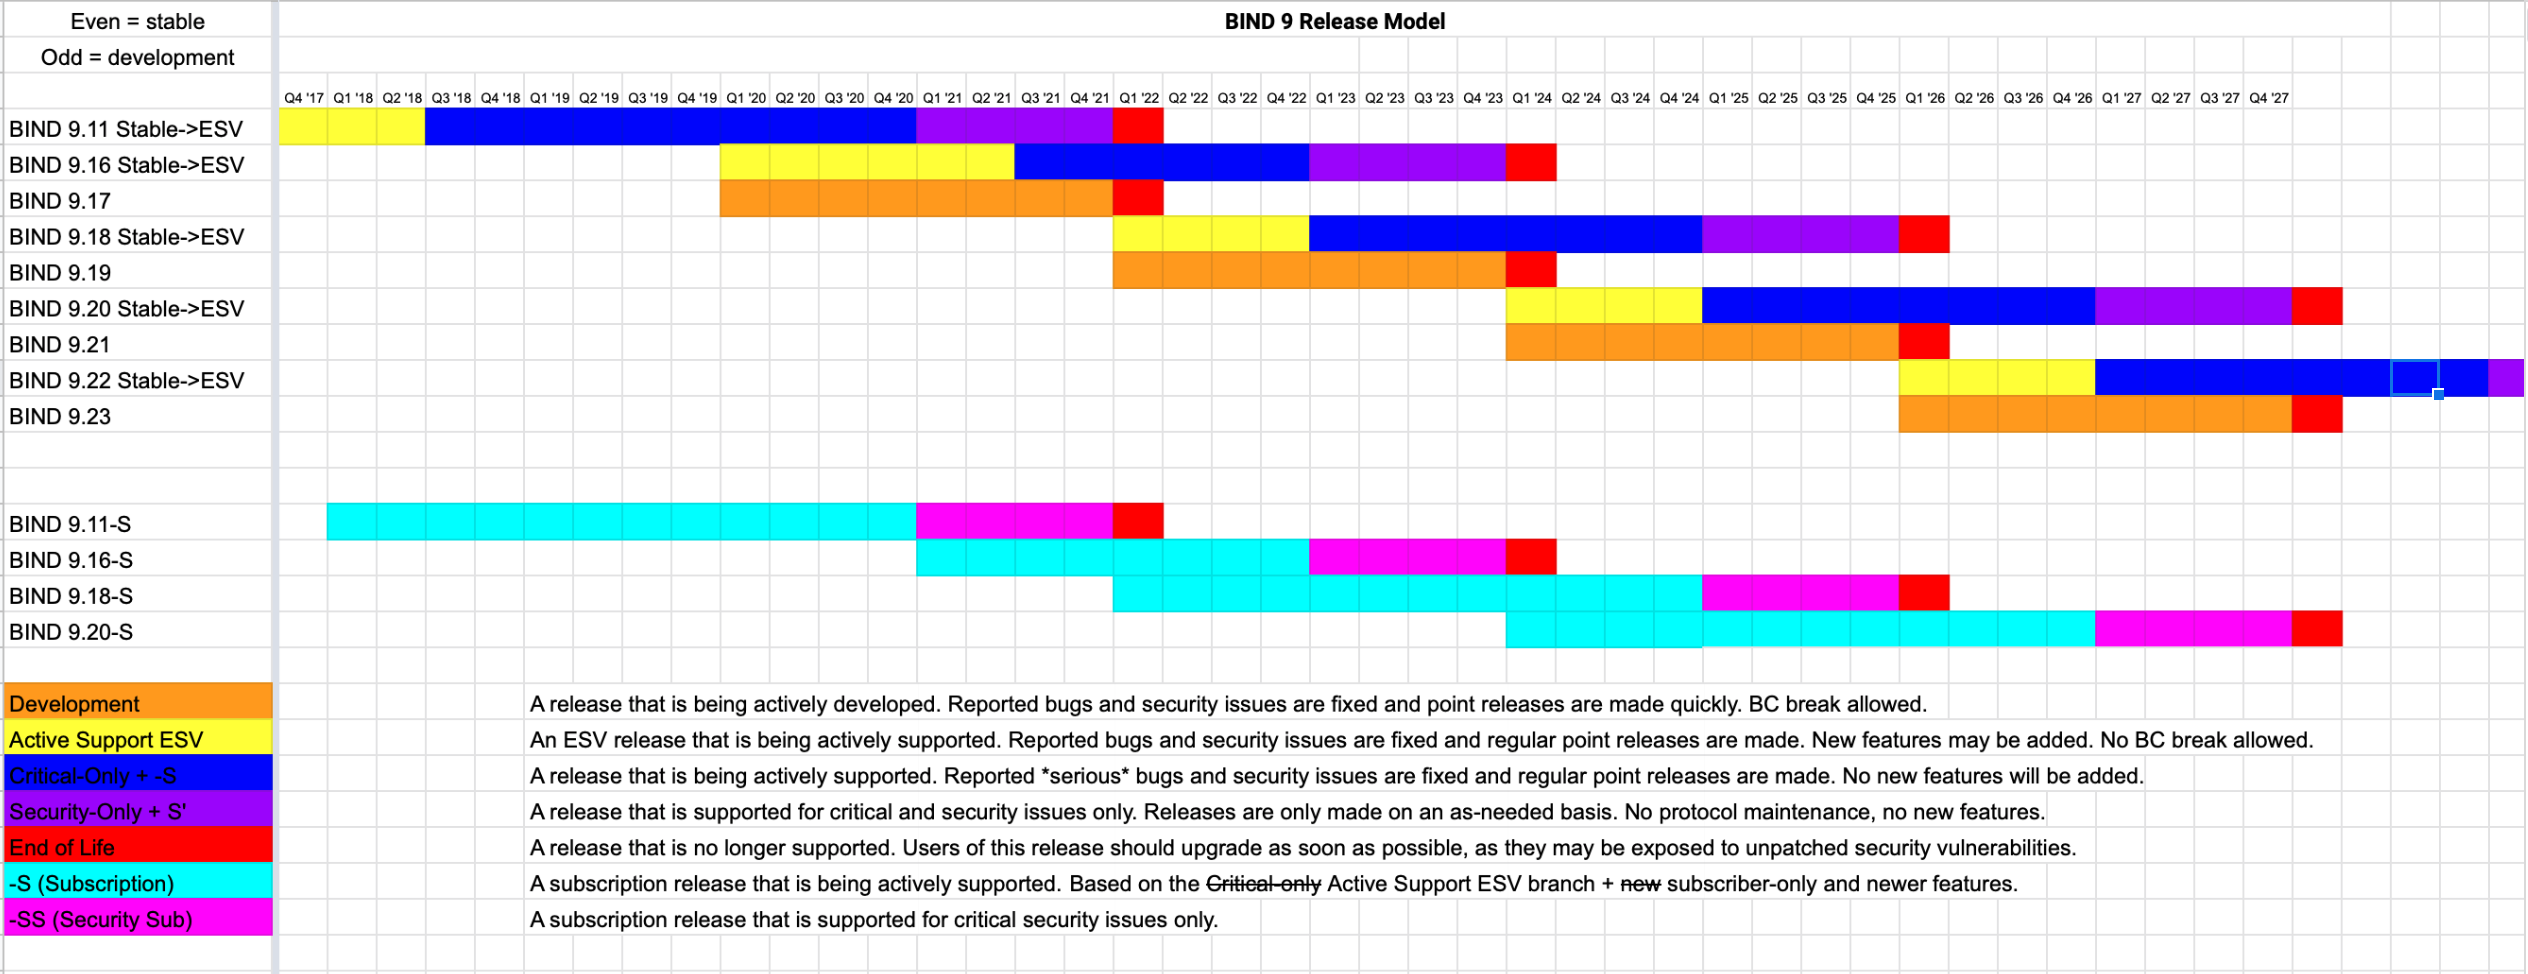 BIND 9 Release Model (2021 update)